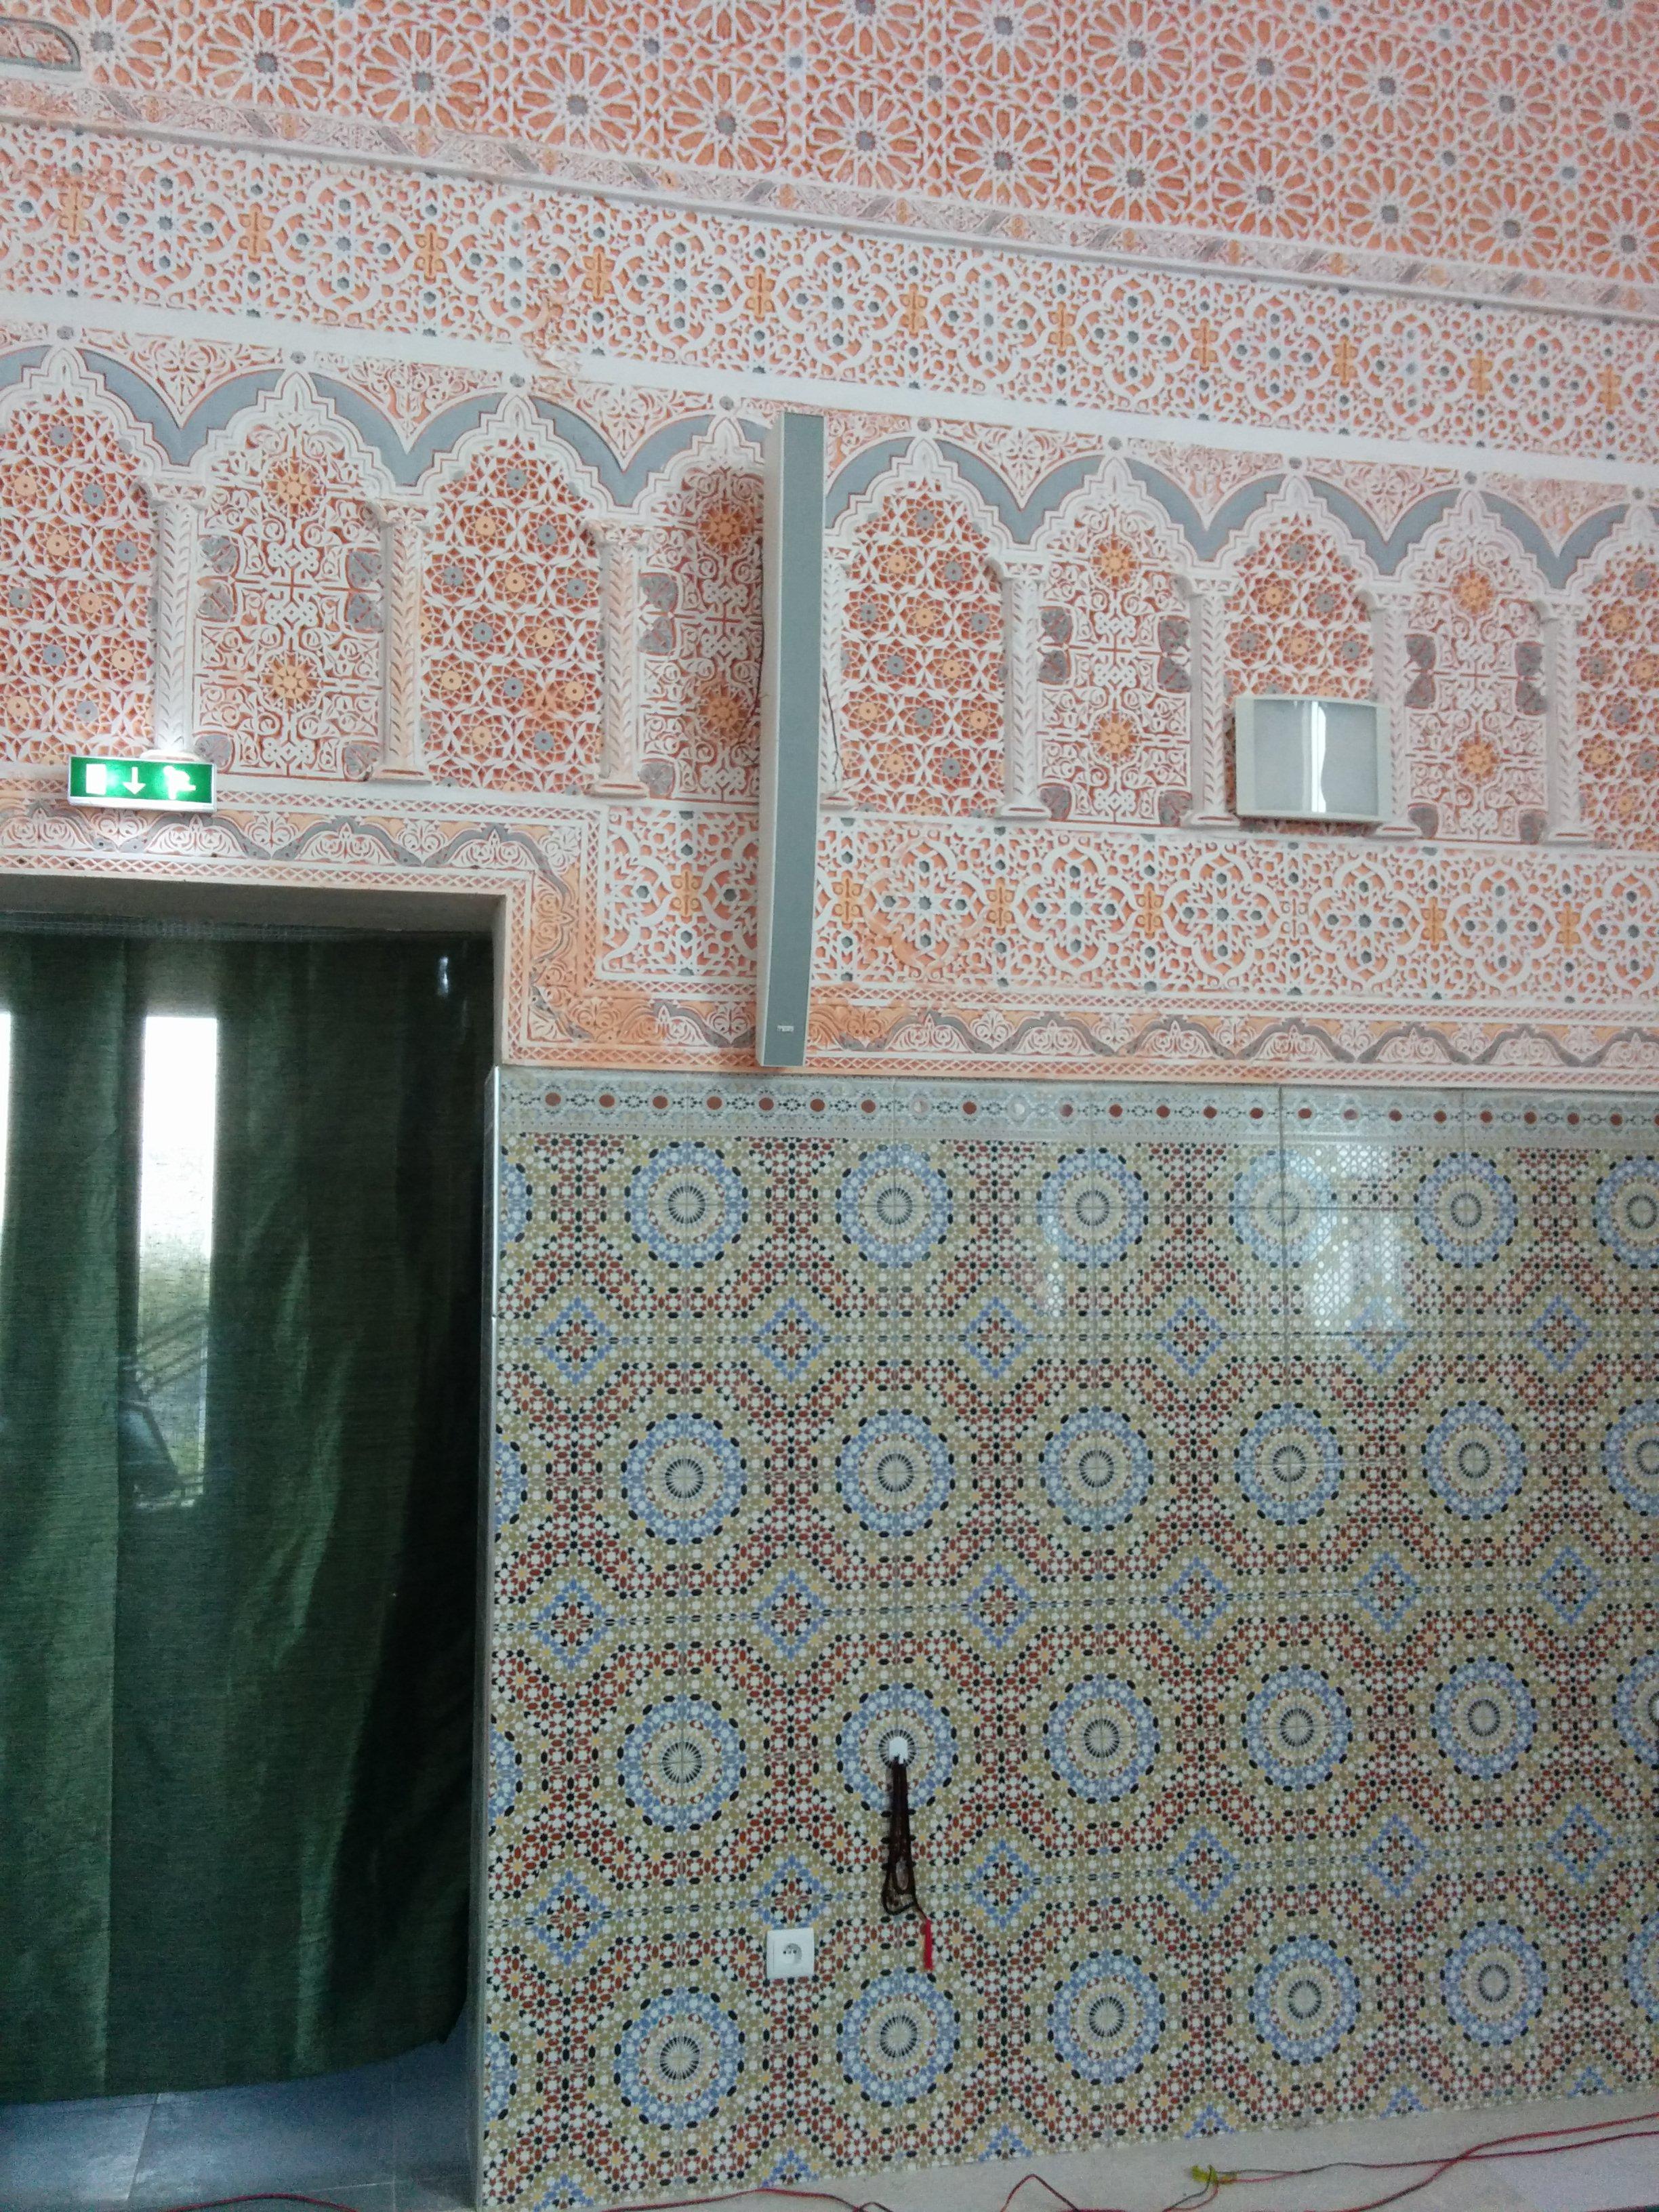 Grande mosquée des Ulis